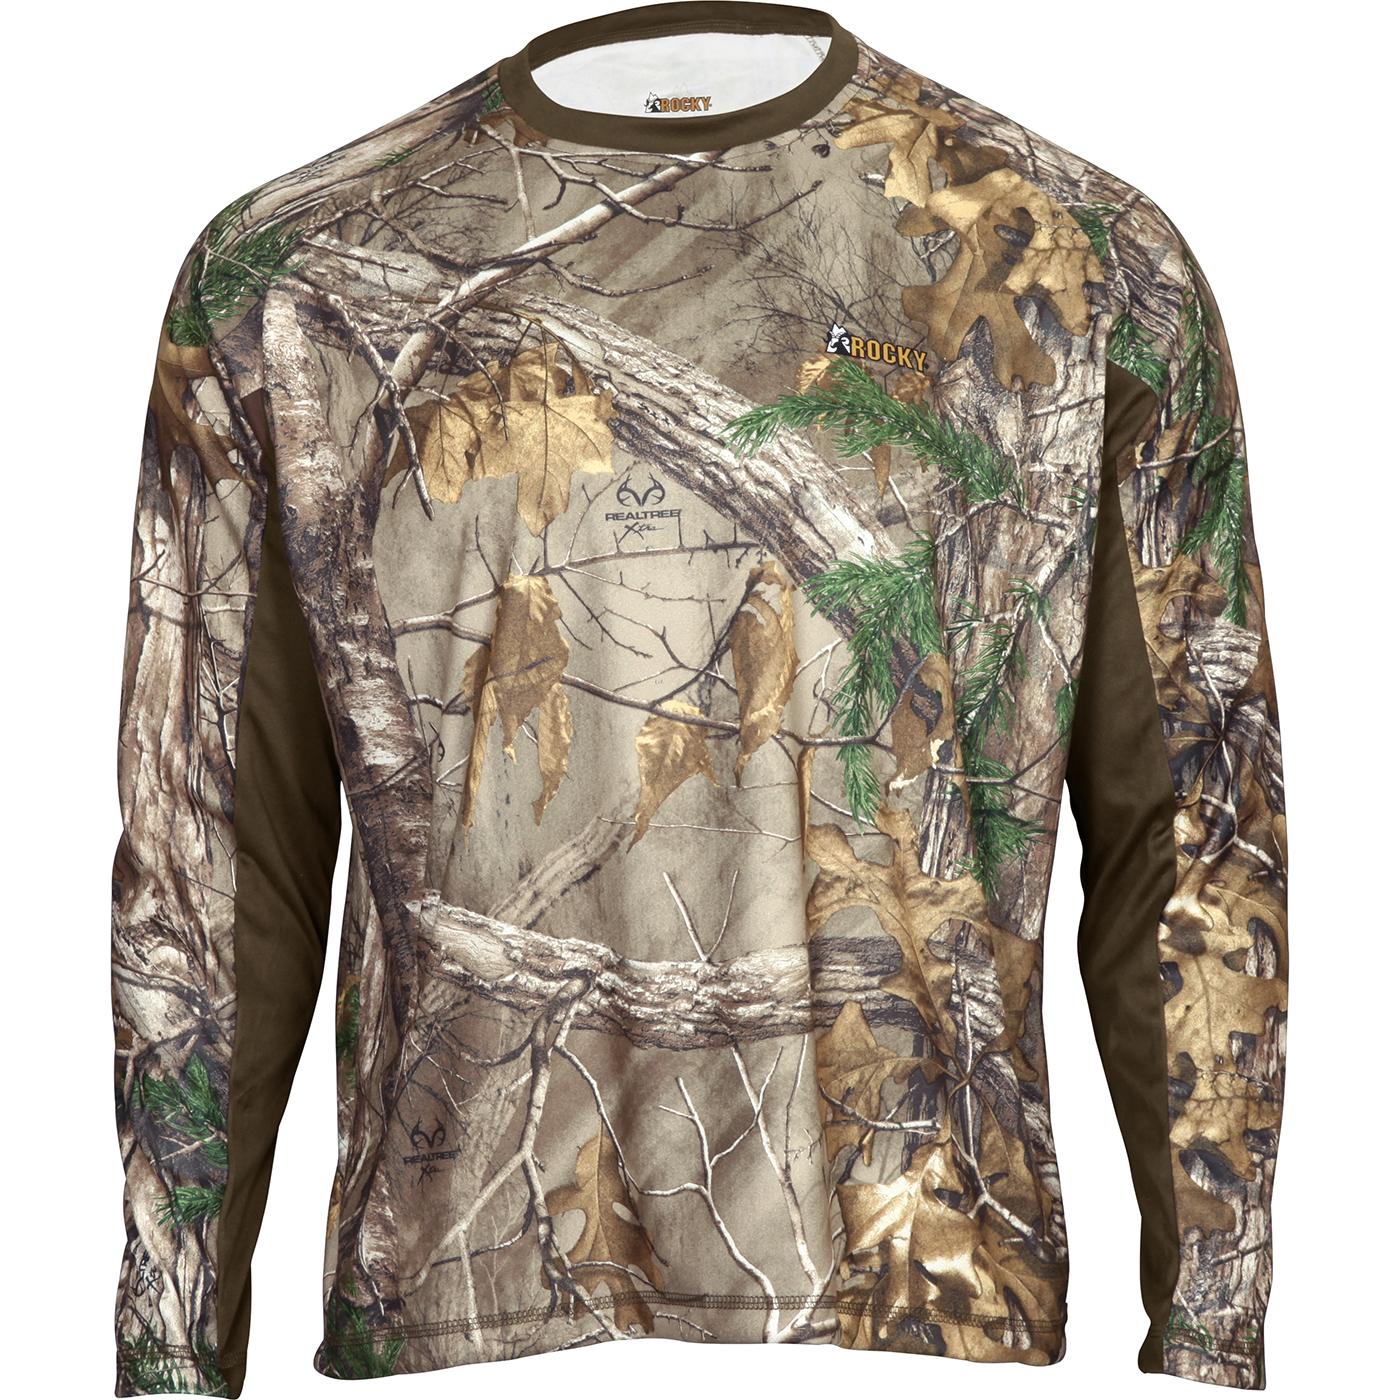 0bab50b537740 Rocky SilentHunter Long-Sleeve Scent IQ Shirt, Rltre Xtra, large